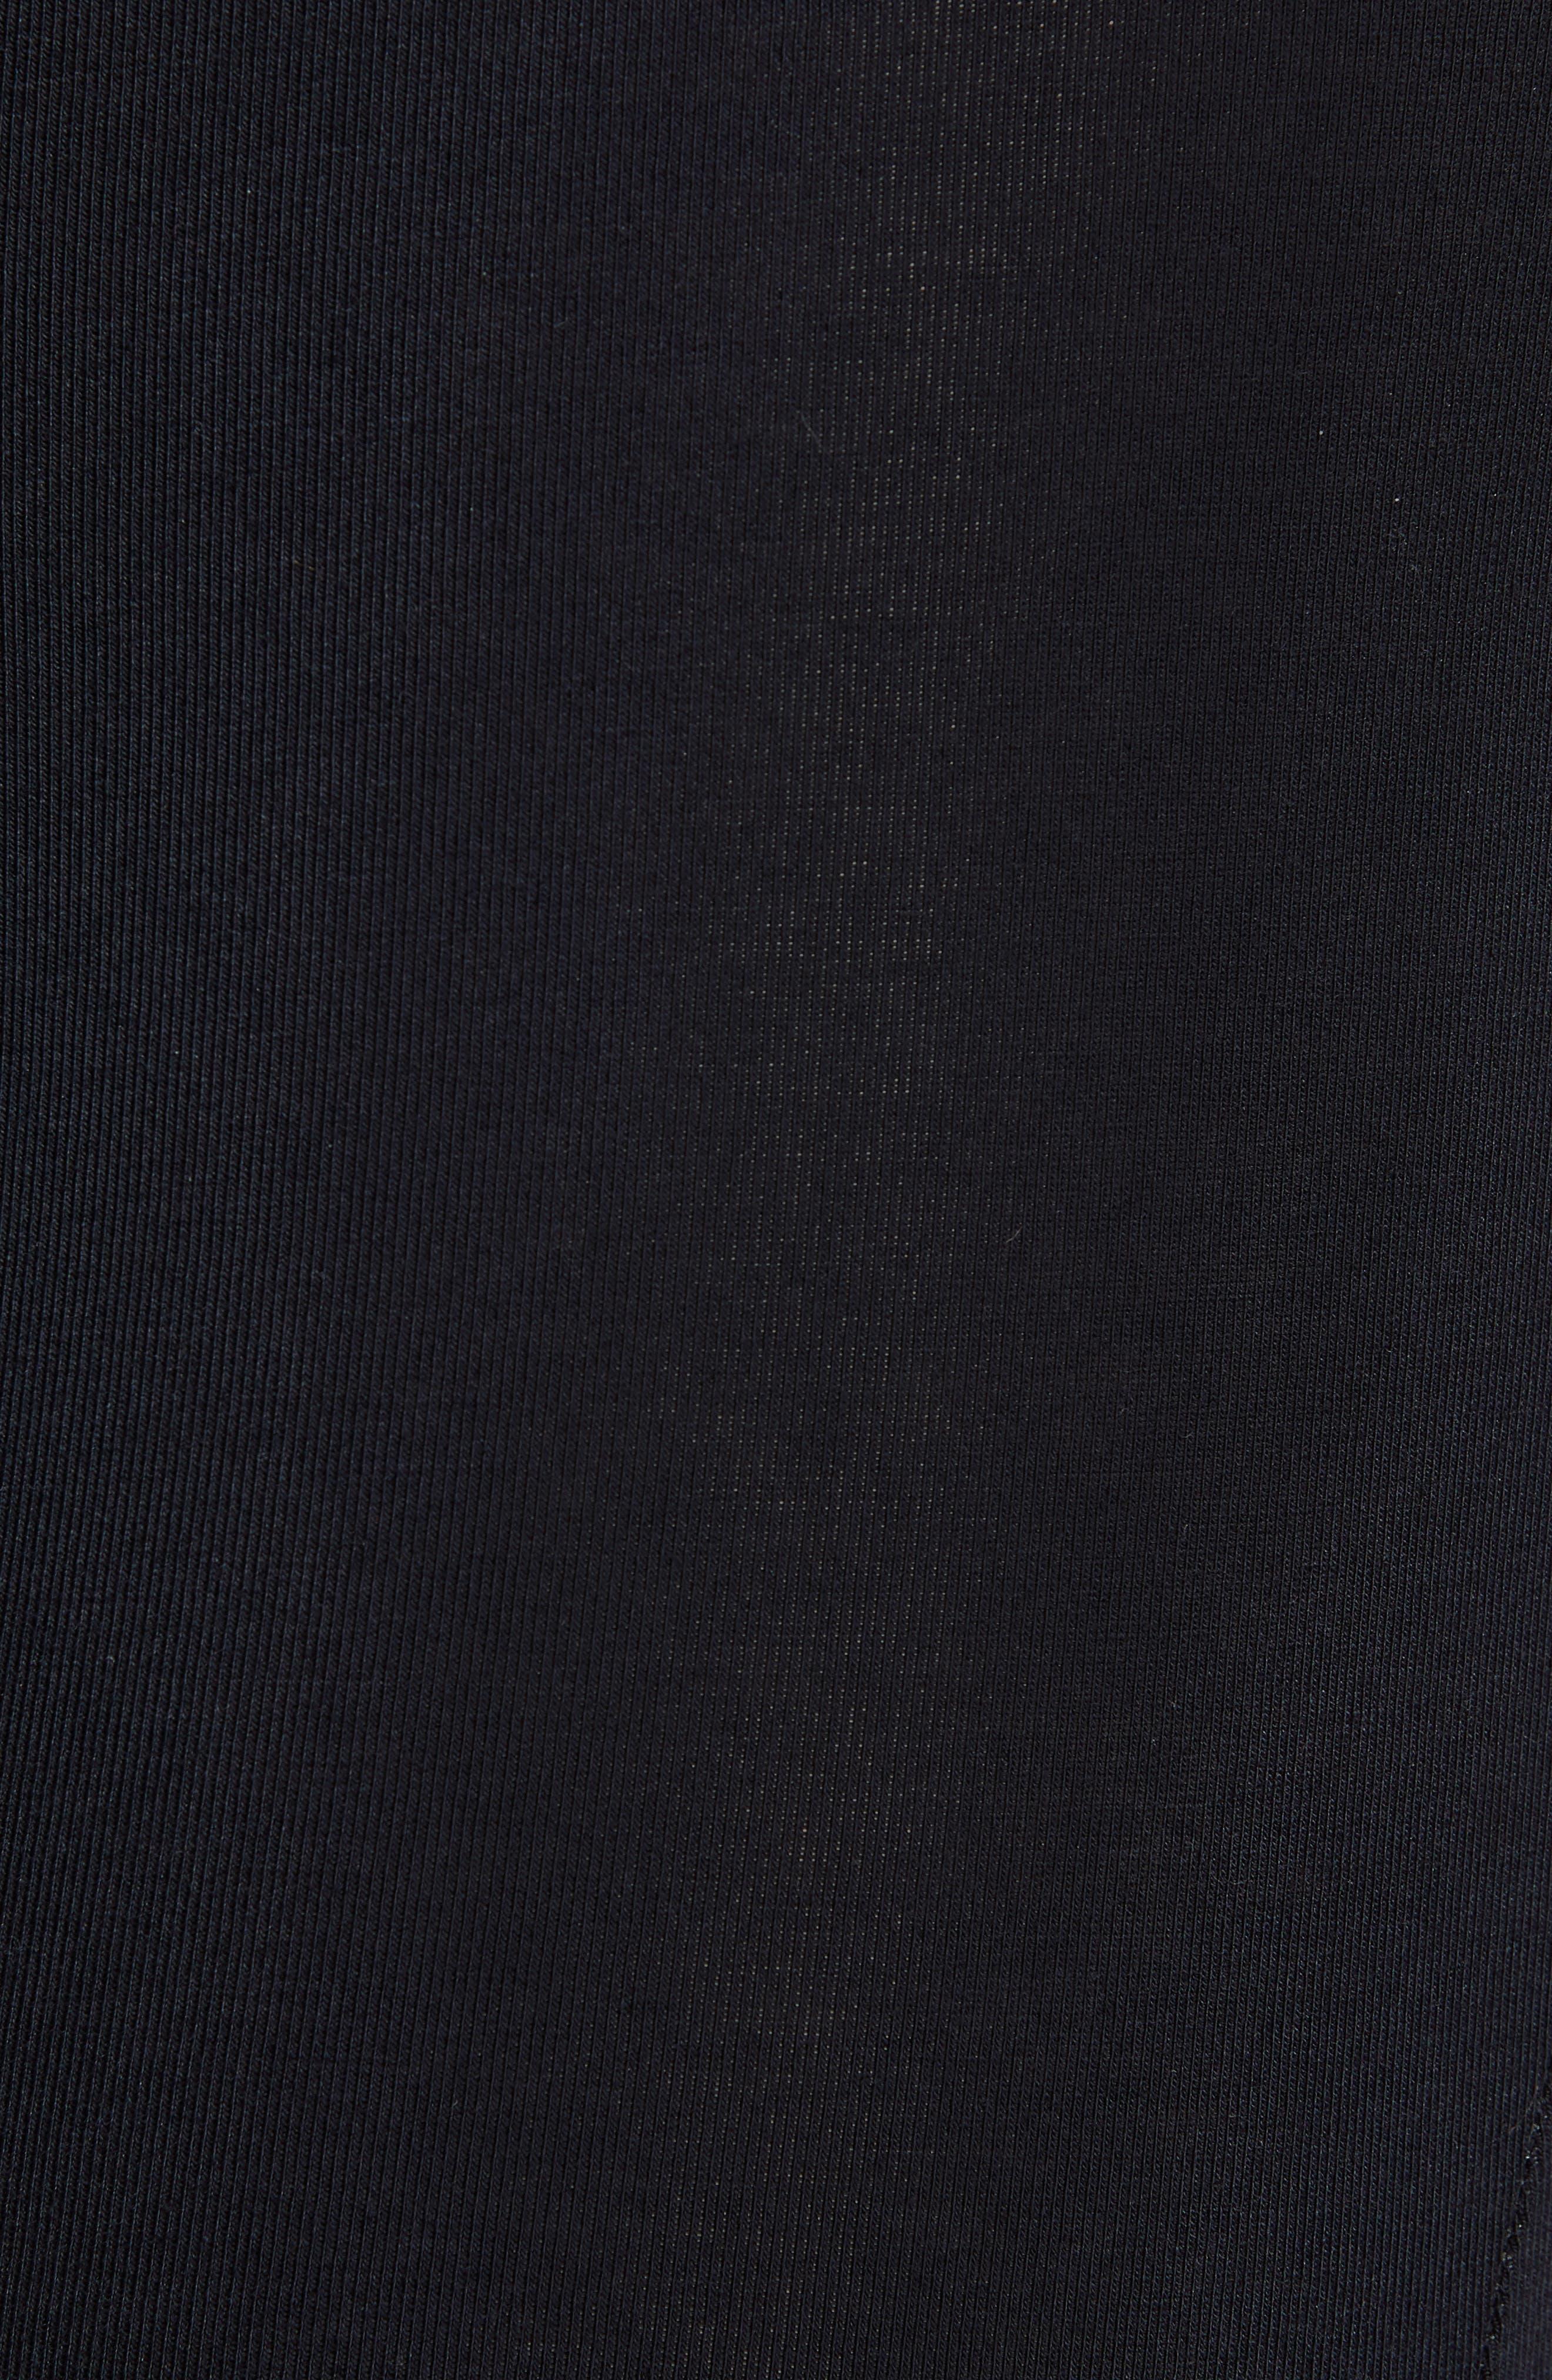 Stretch Cotton Trunks,                             Alternate thumbnail 5, color,                             BLACK